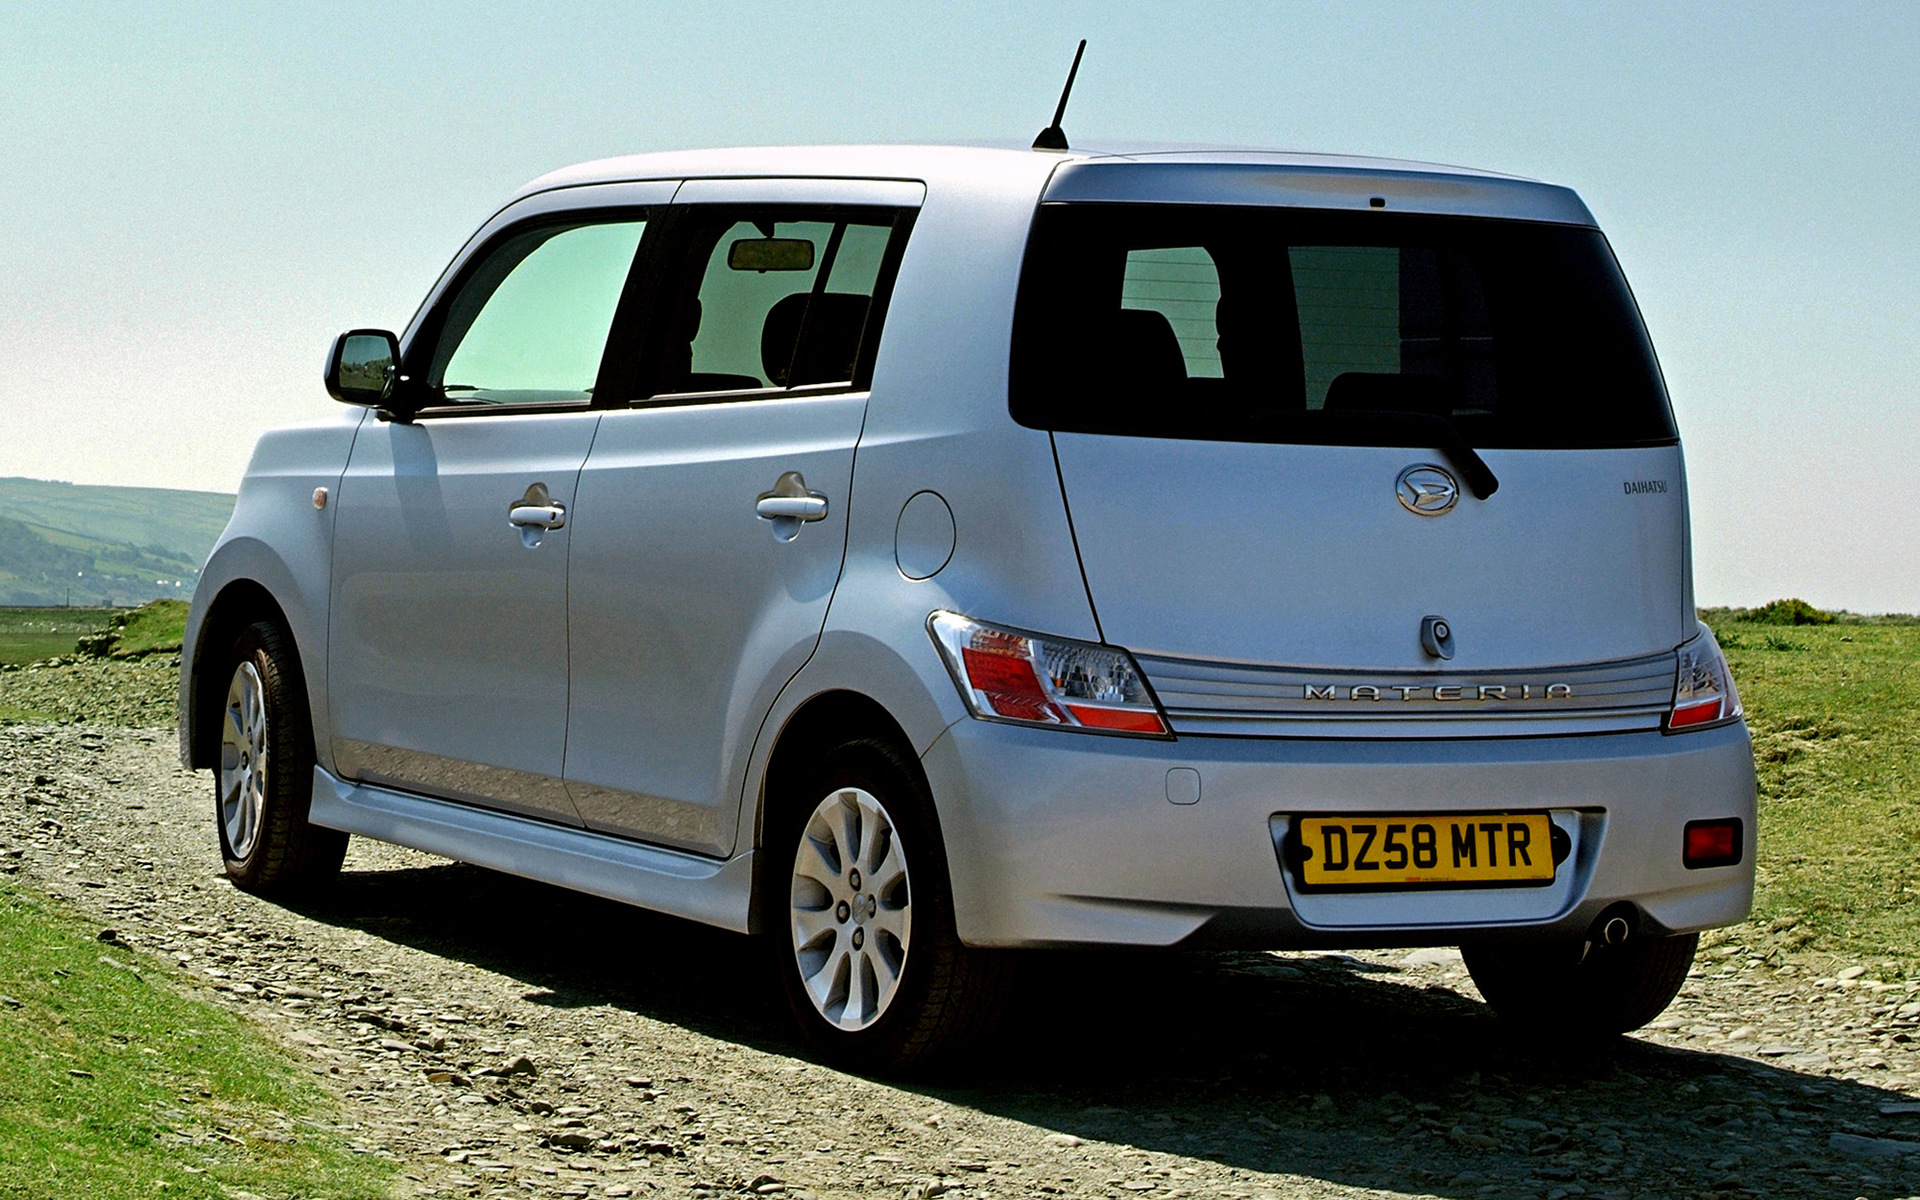 2007 Daihatsu Materia (UK) - Wallpapers and HD Images | Car